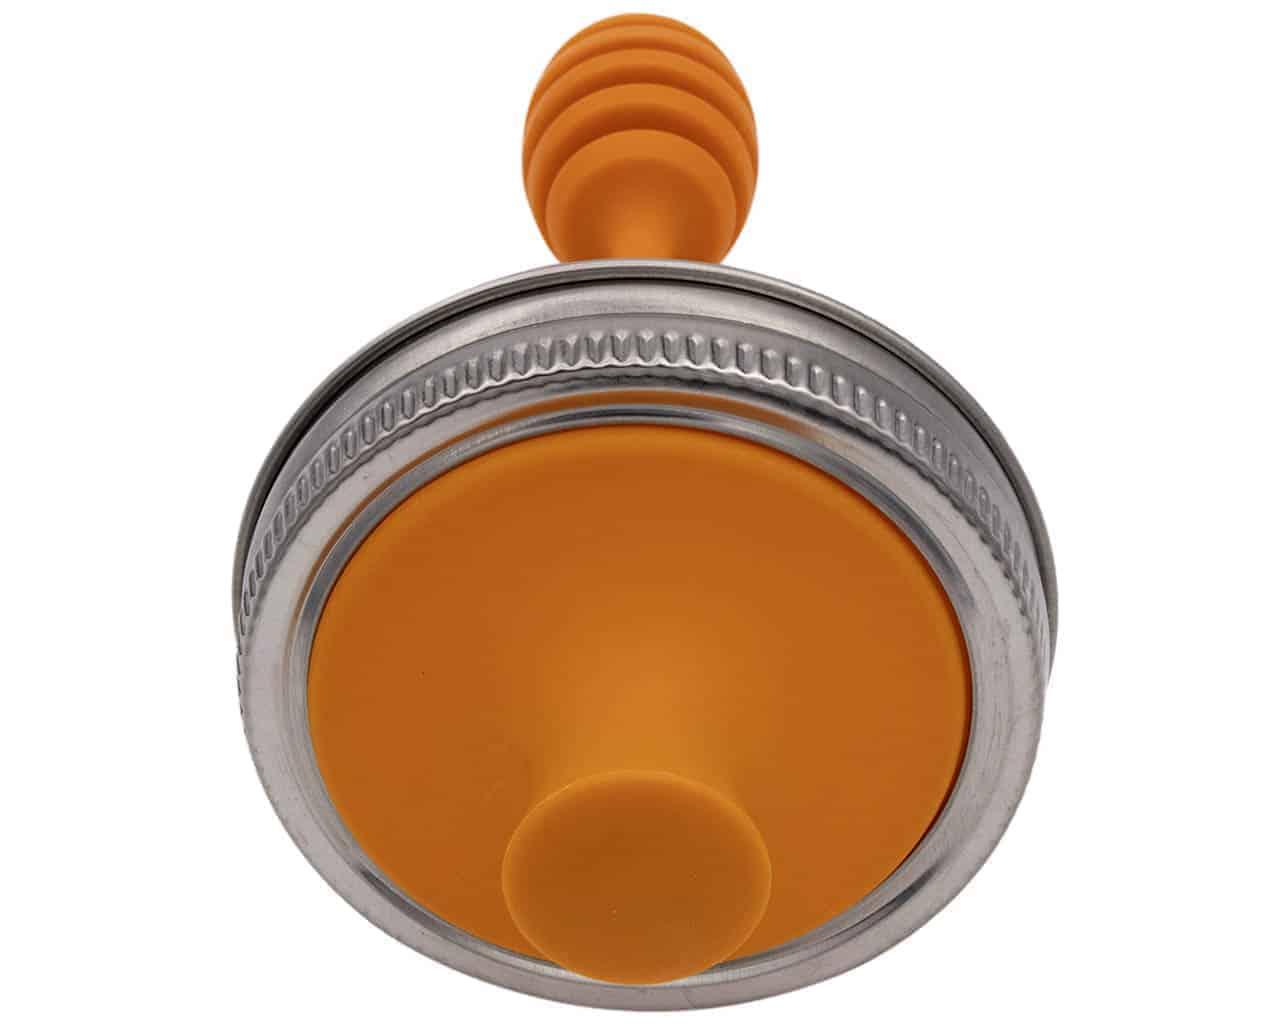 1PC Natural Wood Spice Jar with Lid Fashion Sugar Bowl